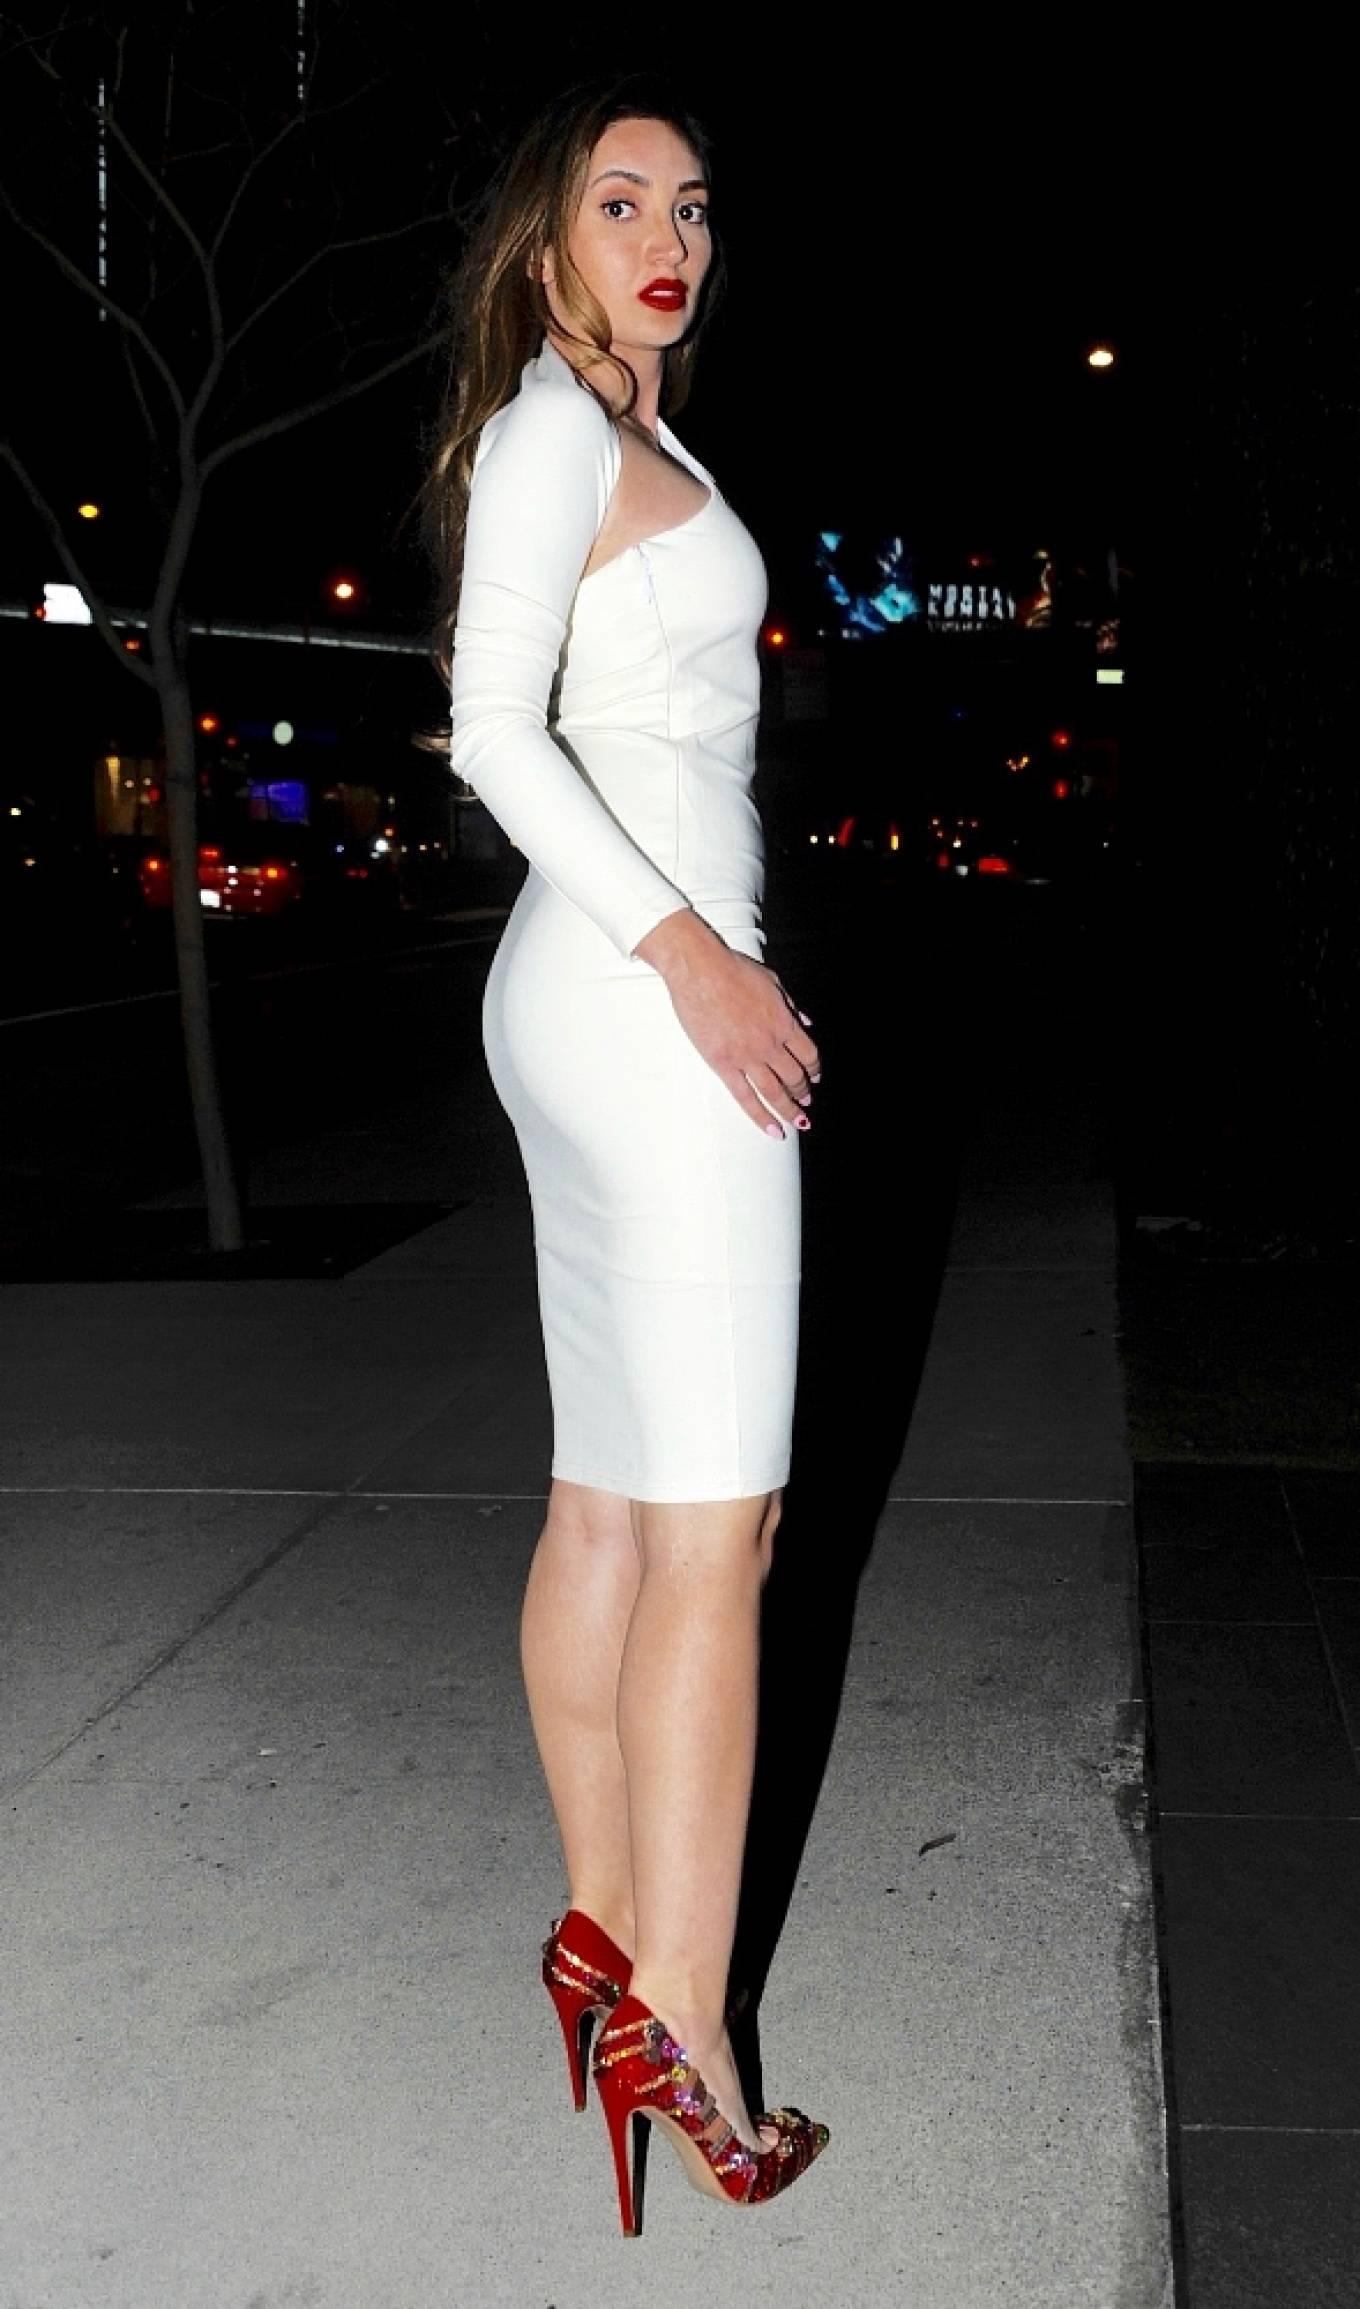 Megan Pormer 2021 : Megan Pormer – In white tight dress going to Nusr-Et Steakhouse in Beverly Hills-02